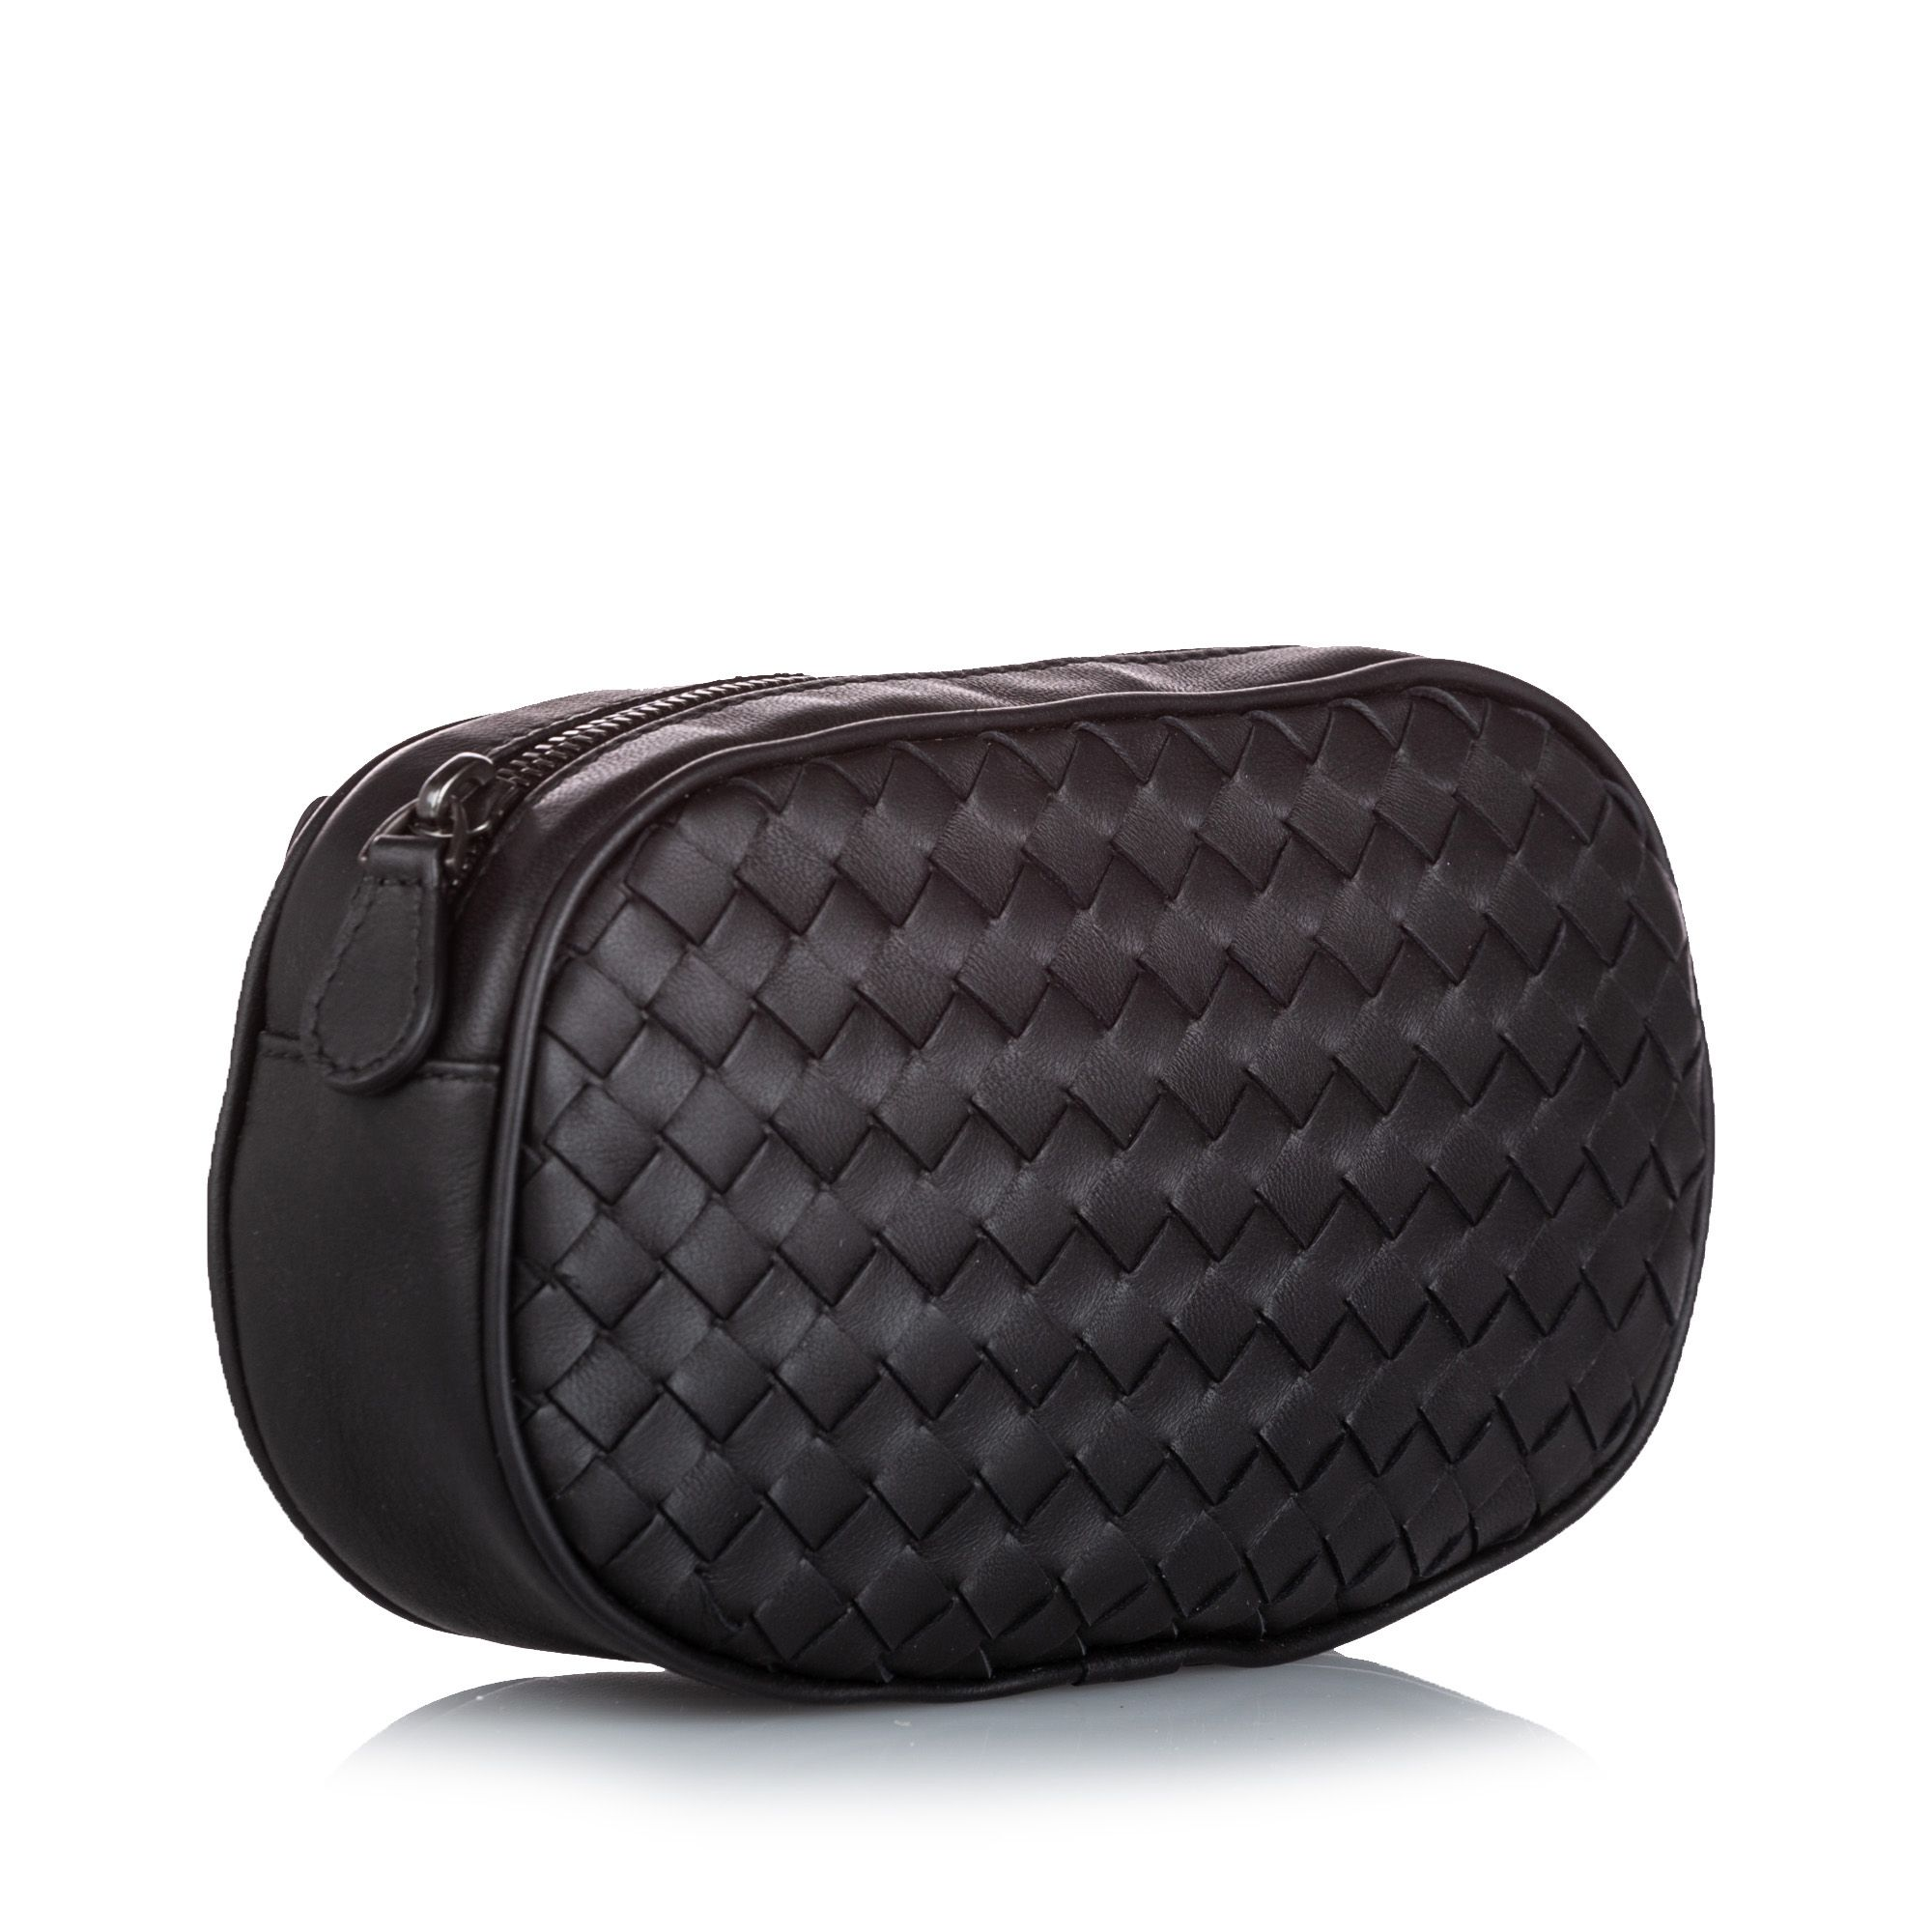 Vintage Bottega Veneta Intrecciato Leather Belt Bag Black